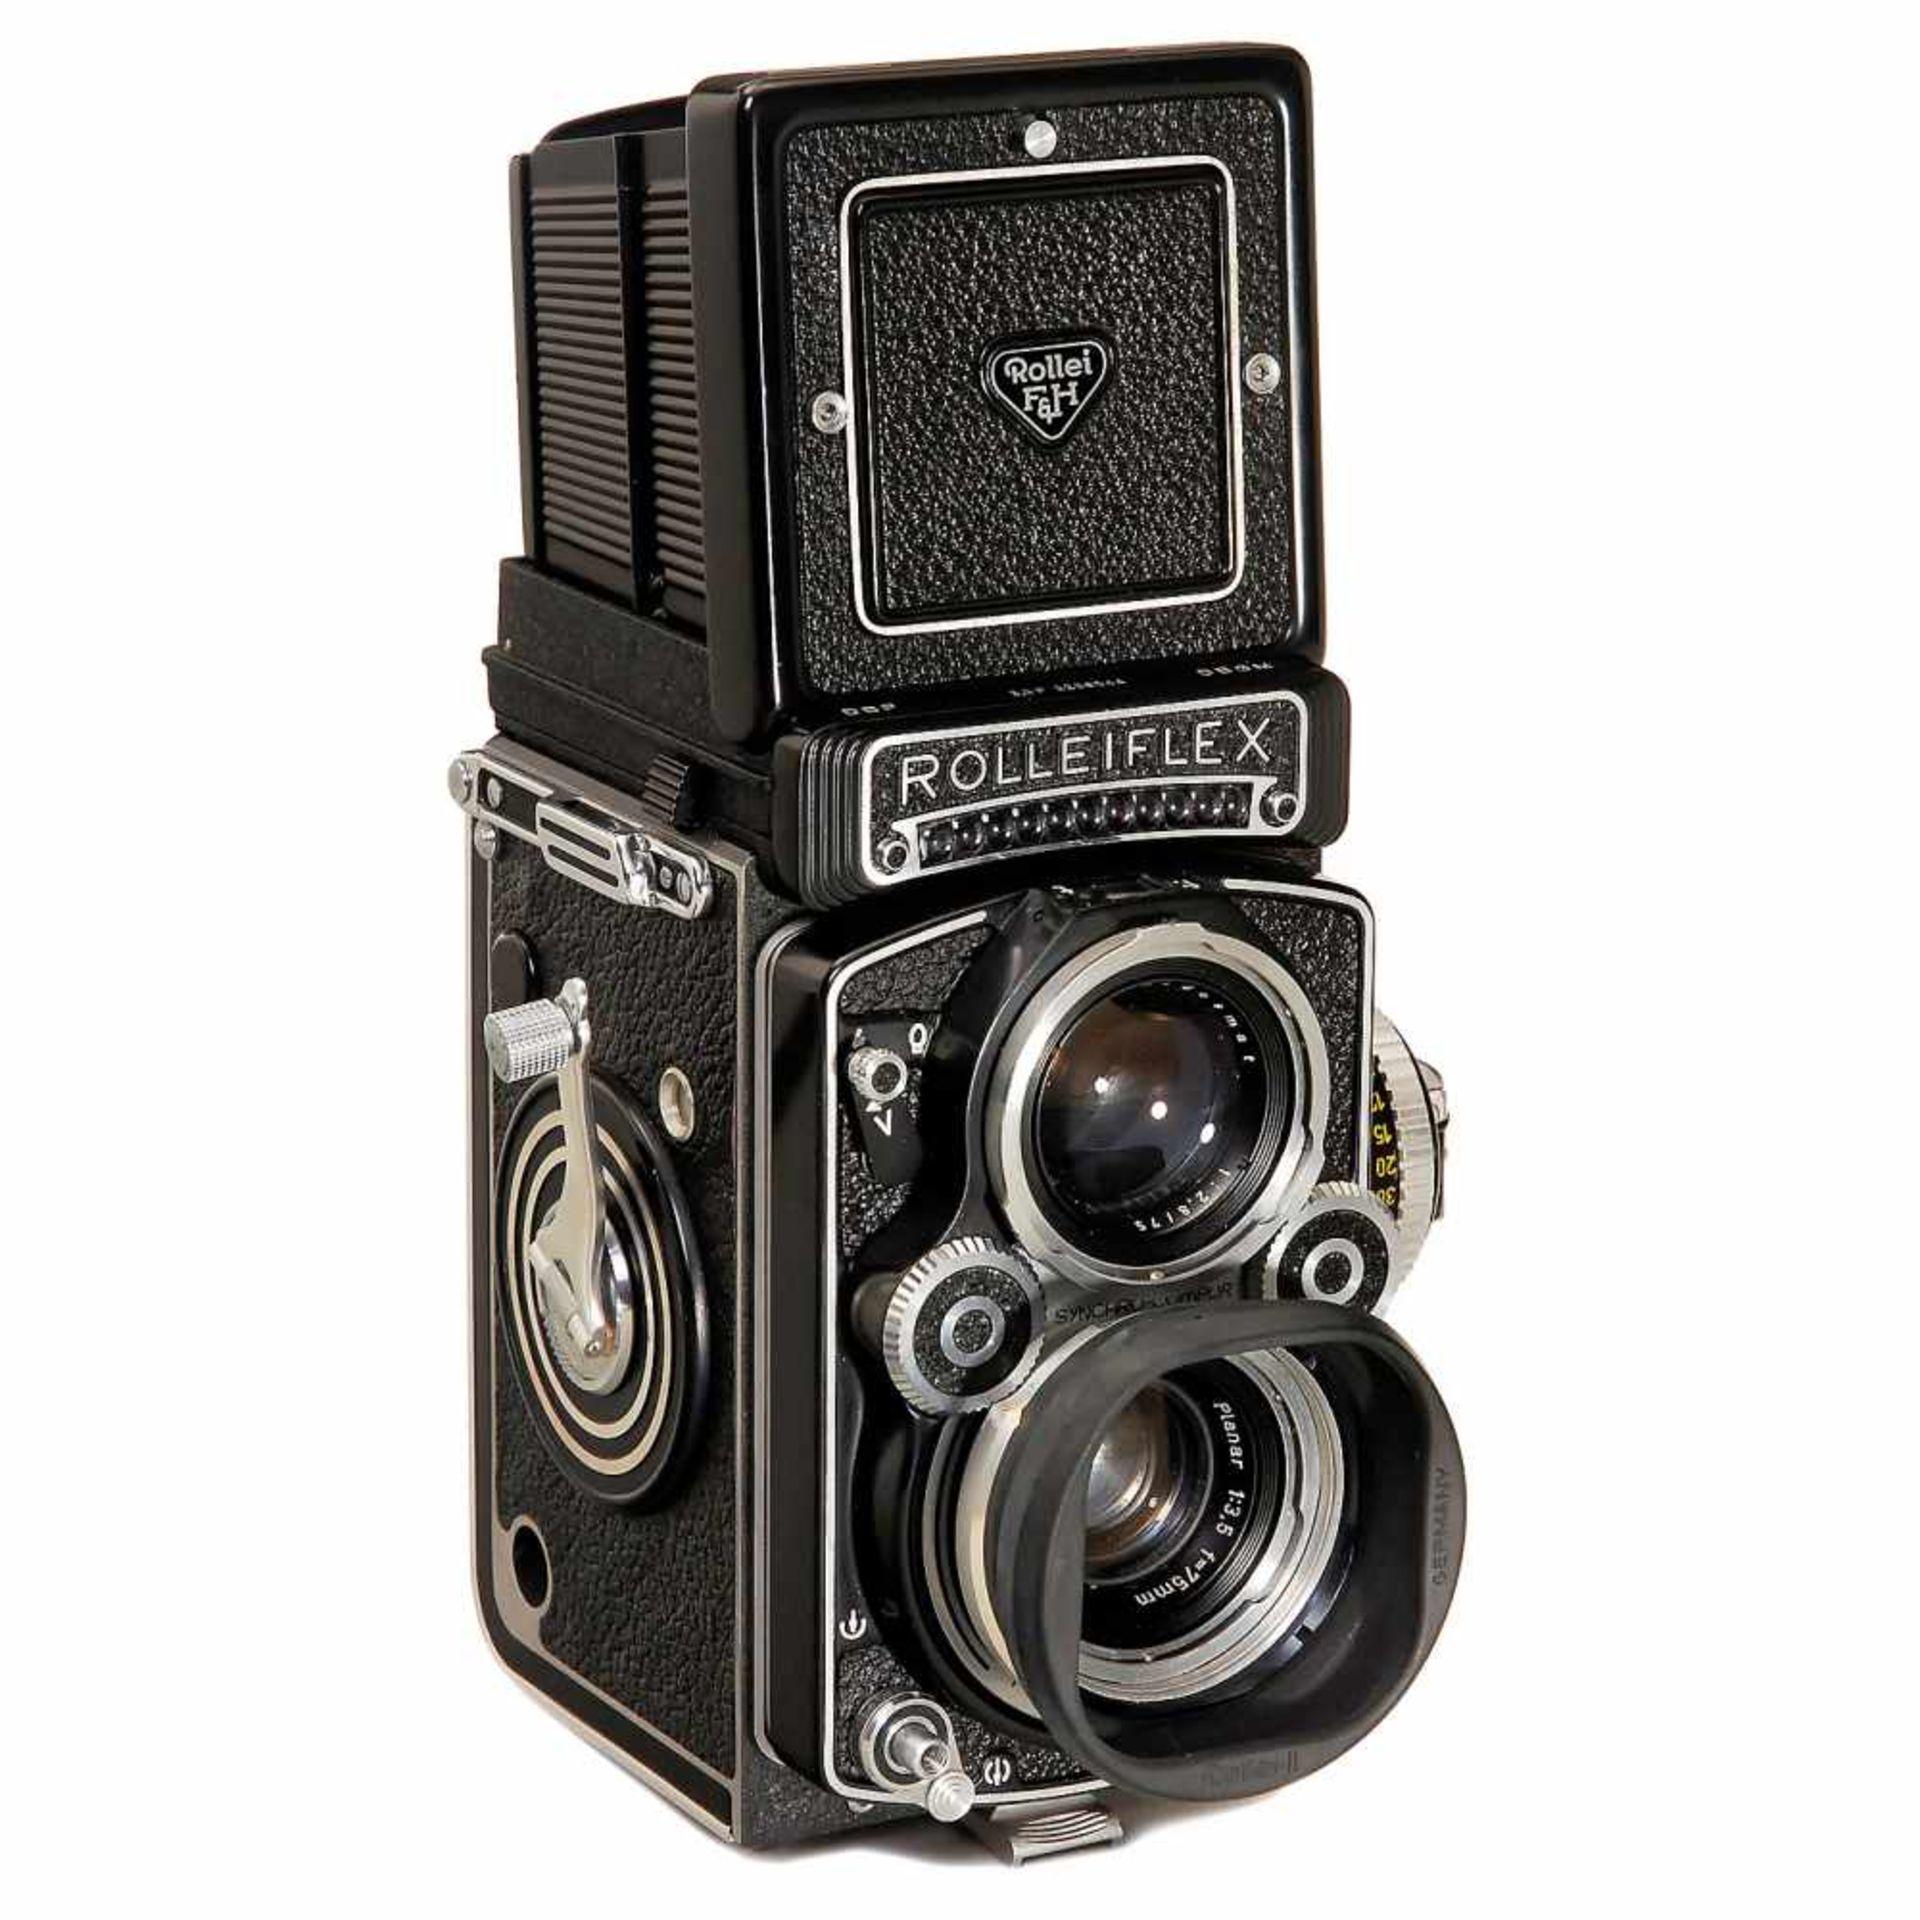 "Rolleiflex 3,5F ""Planar"", 1960Franke & Heidecke, Braunschweig. Third model, no. 3,5 F 2296044,"